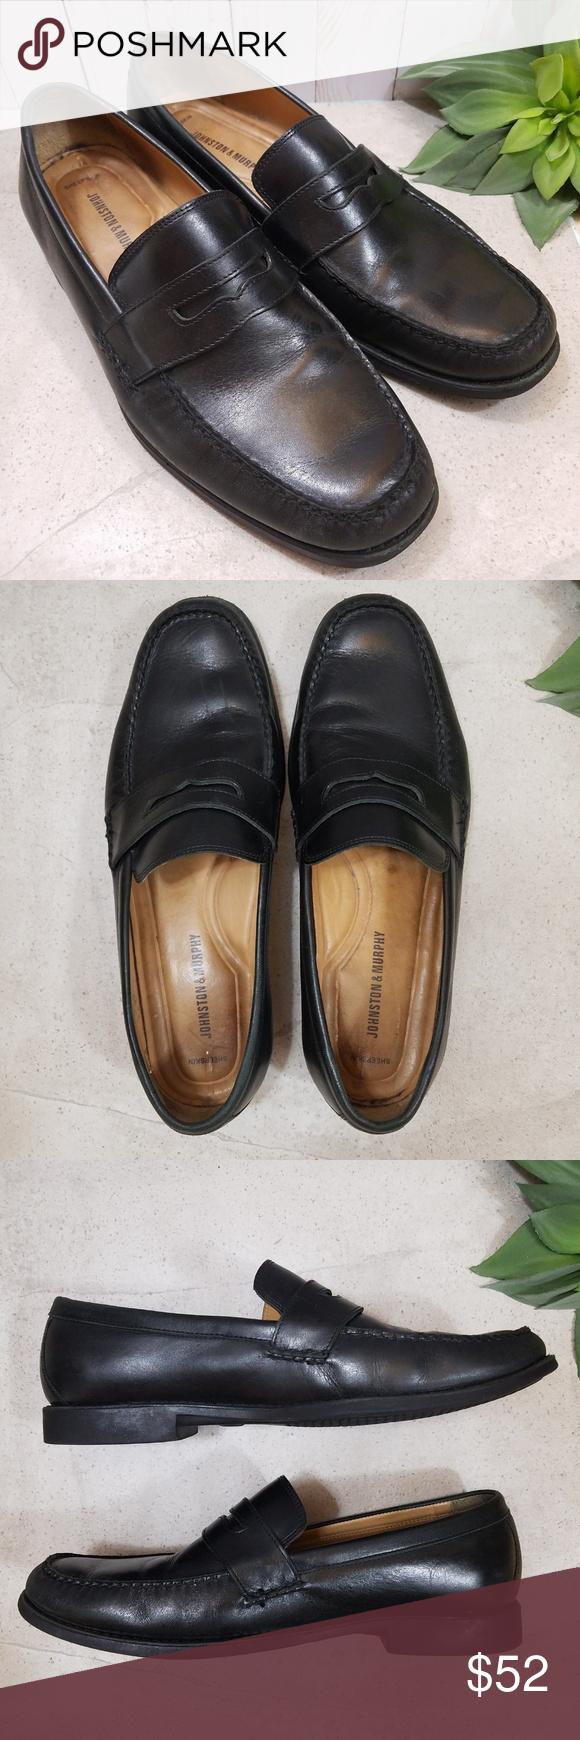 757c0920897 MEN S Johnston   Murphy Comfort Penny Loafers Brand  Johnston   Murphy  Size  Men s 11